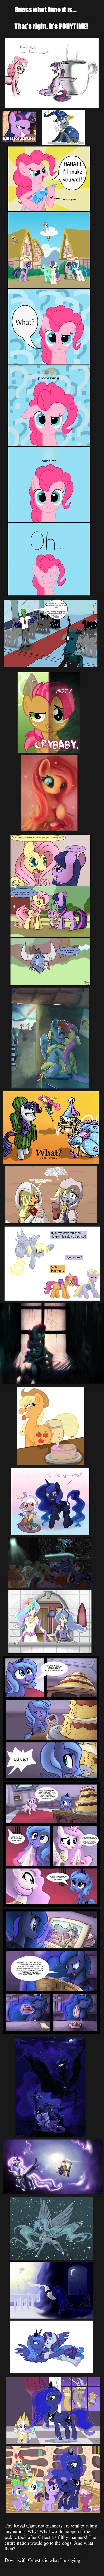 Ponycomp 223. Ponycomp 222: /channel/ponytime/Ponycomp+222/gnsjGta/ DOWNLOAD LINK: docs.google.com/folder/d/0B4SOCzXHPRD.... My Little Pony ponies ponytime